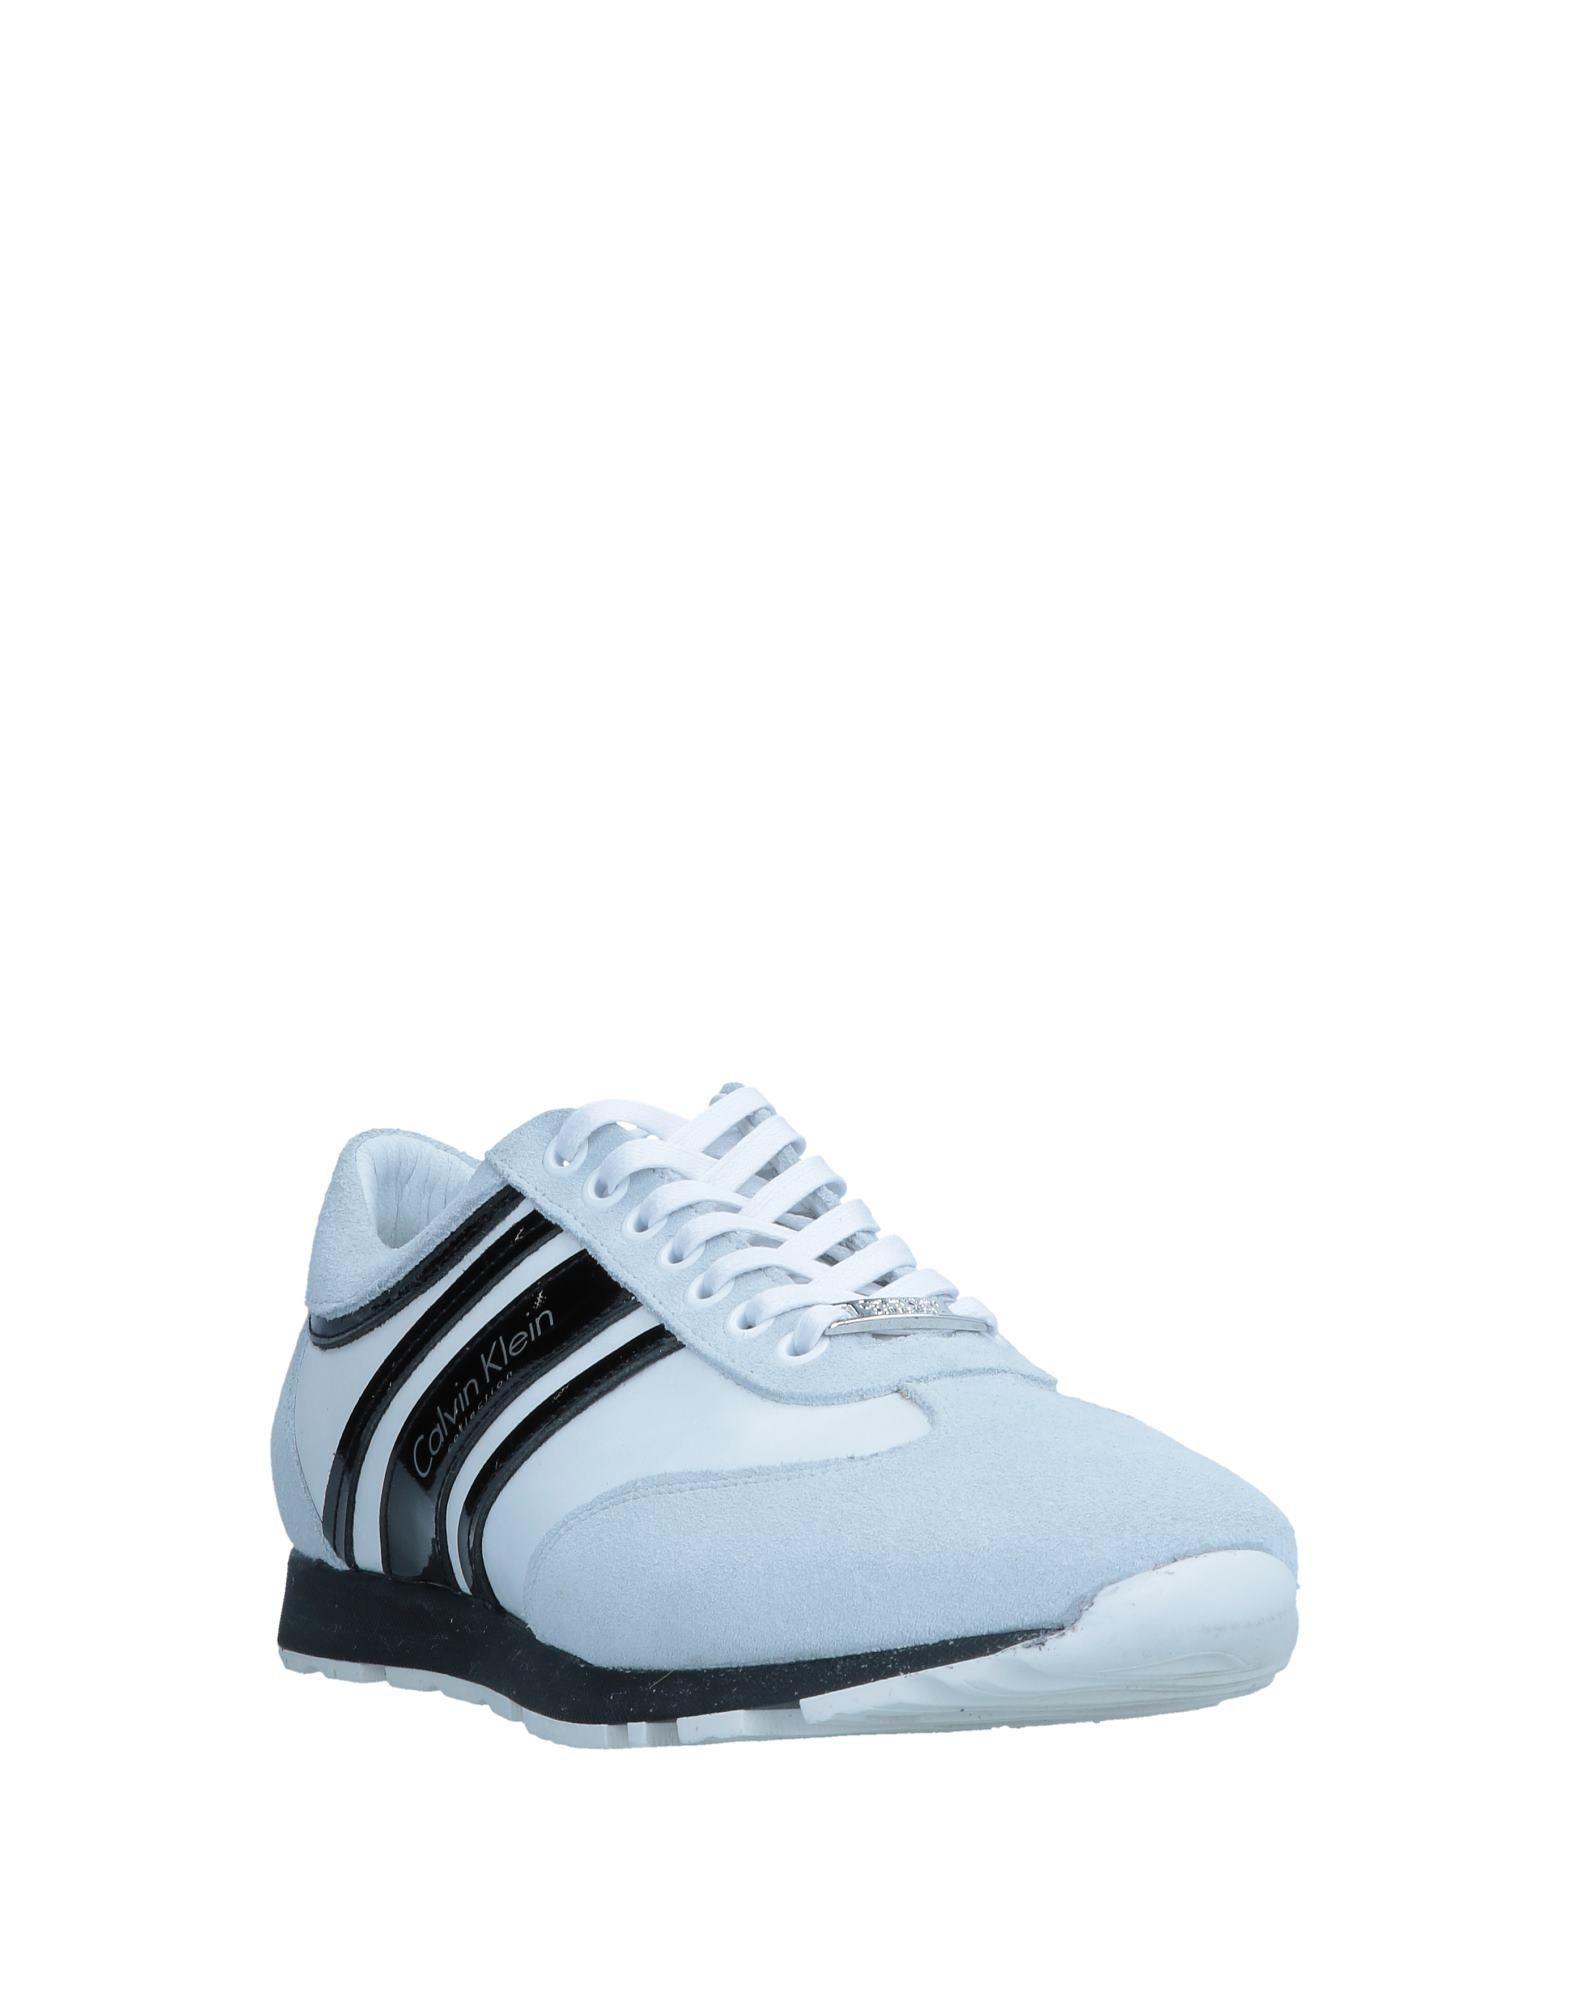 Calvin Klein Sneakers Herren  11542165TV Gute Qualität beliebte Schuhe